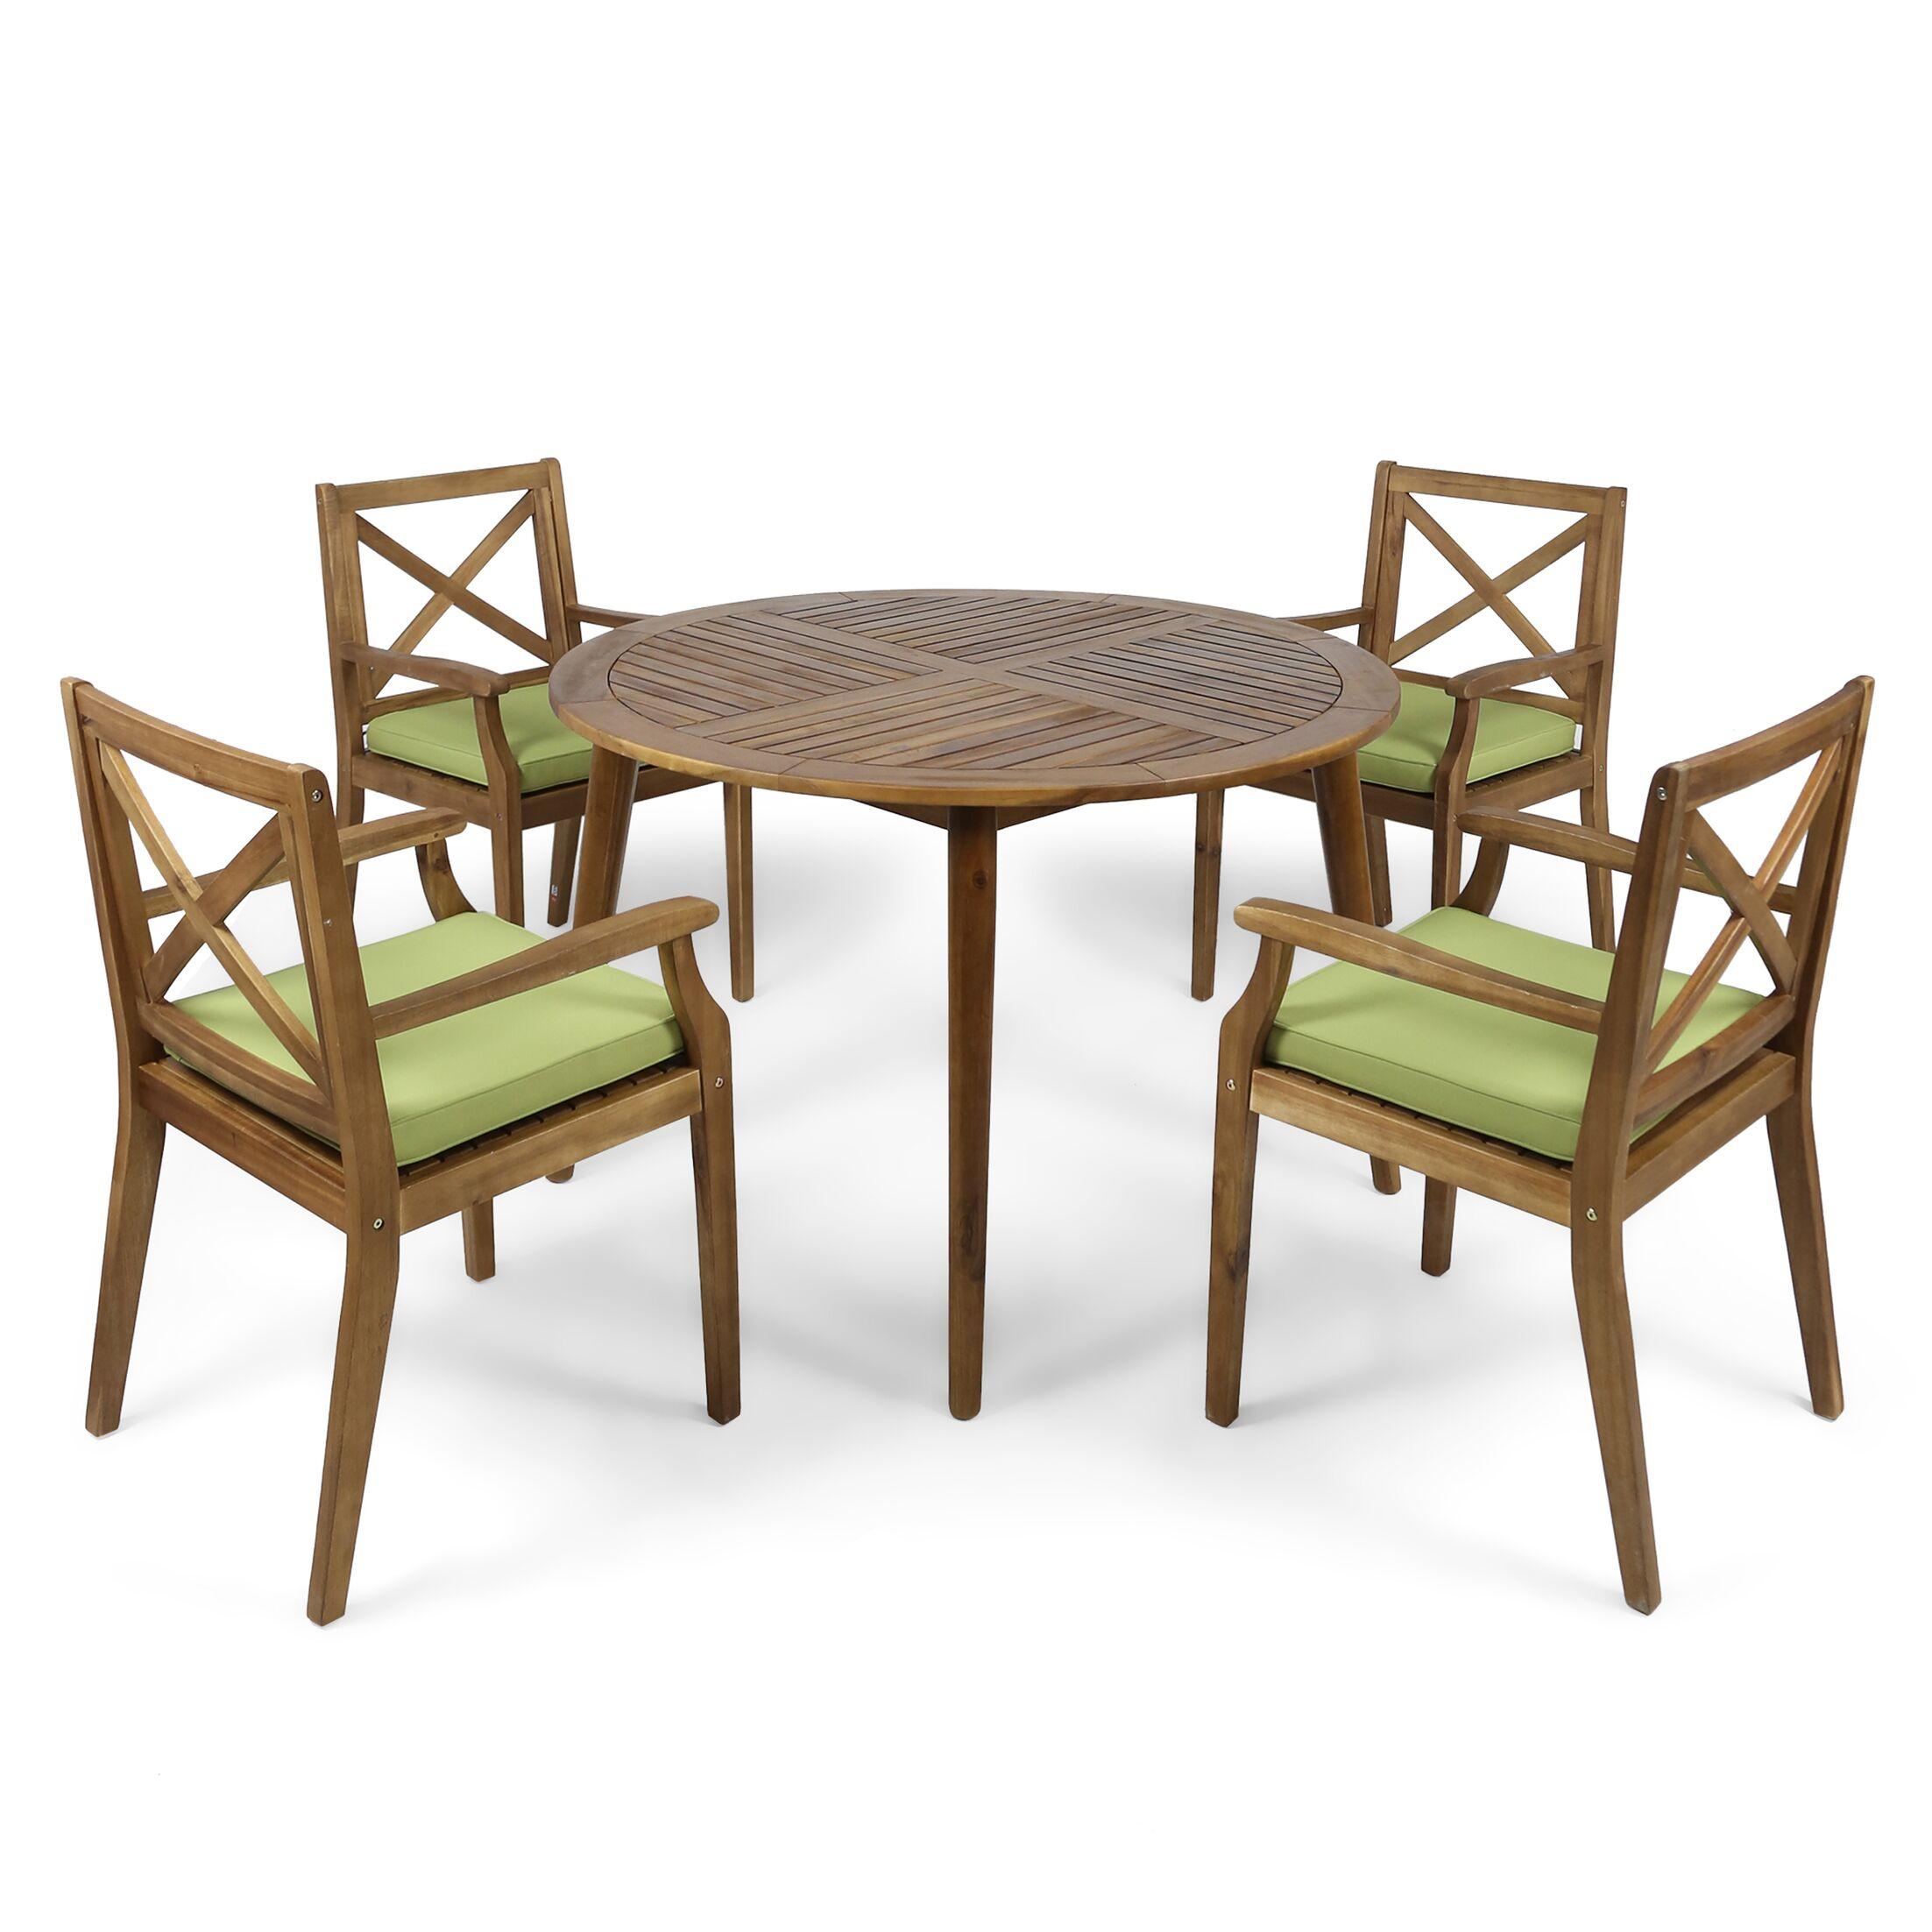 Geneva 5 Piece Teak Dining Set with Cushions Cushion Color: Green